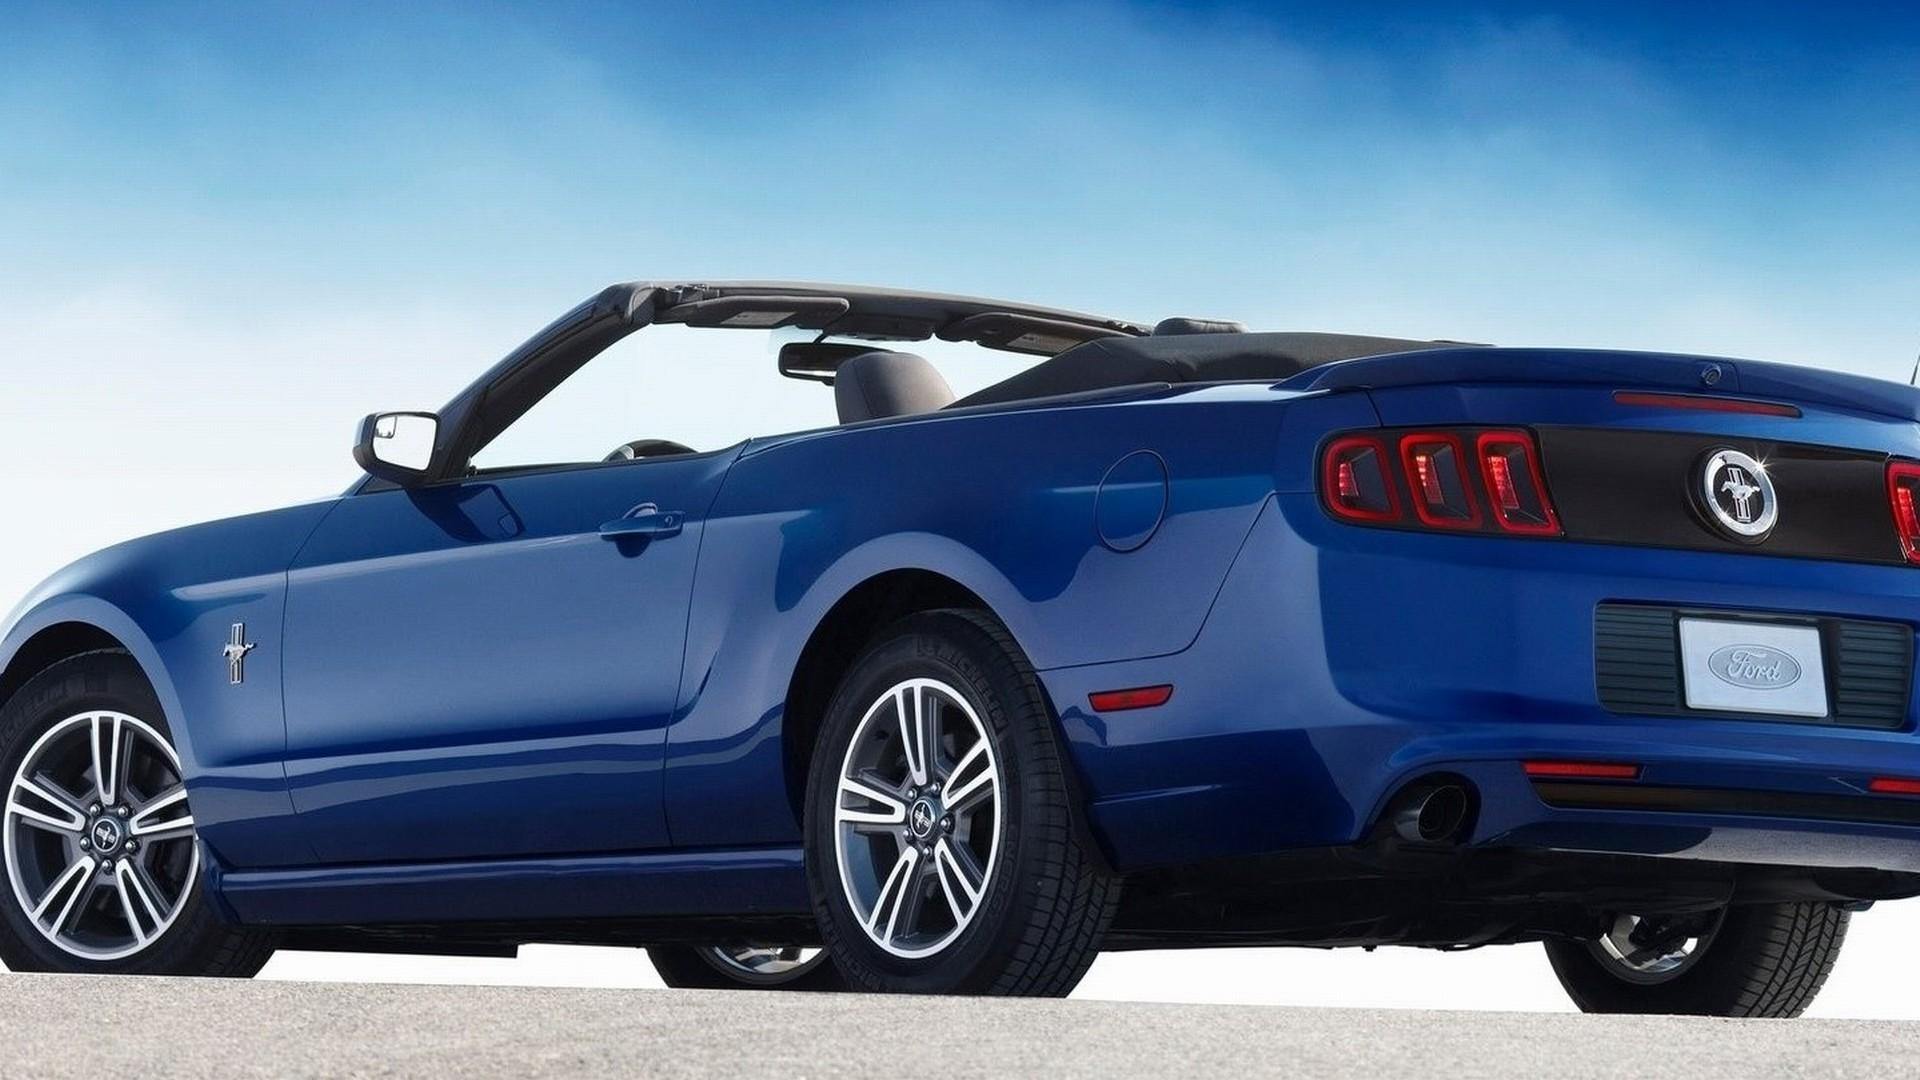 Ford Mustang 2013 1920x1080 WallpapersFord Mustang 1920x1080 1920x1080